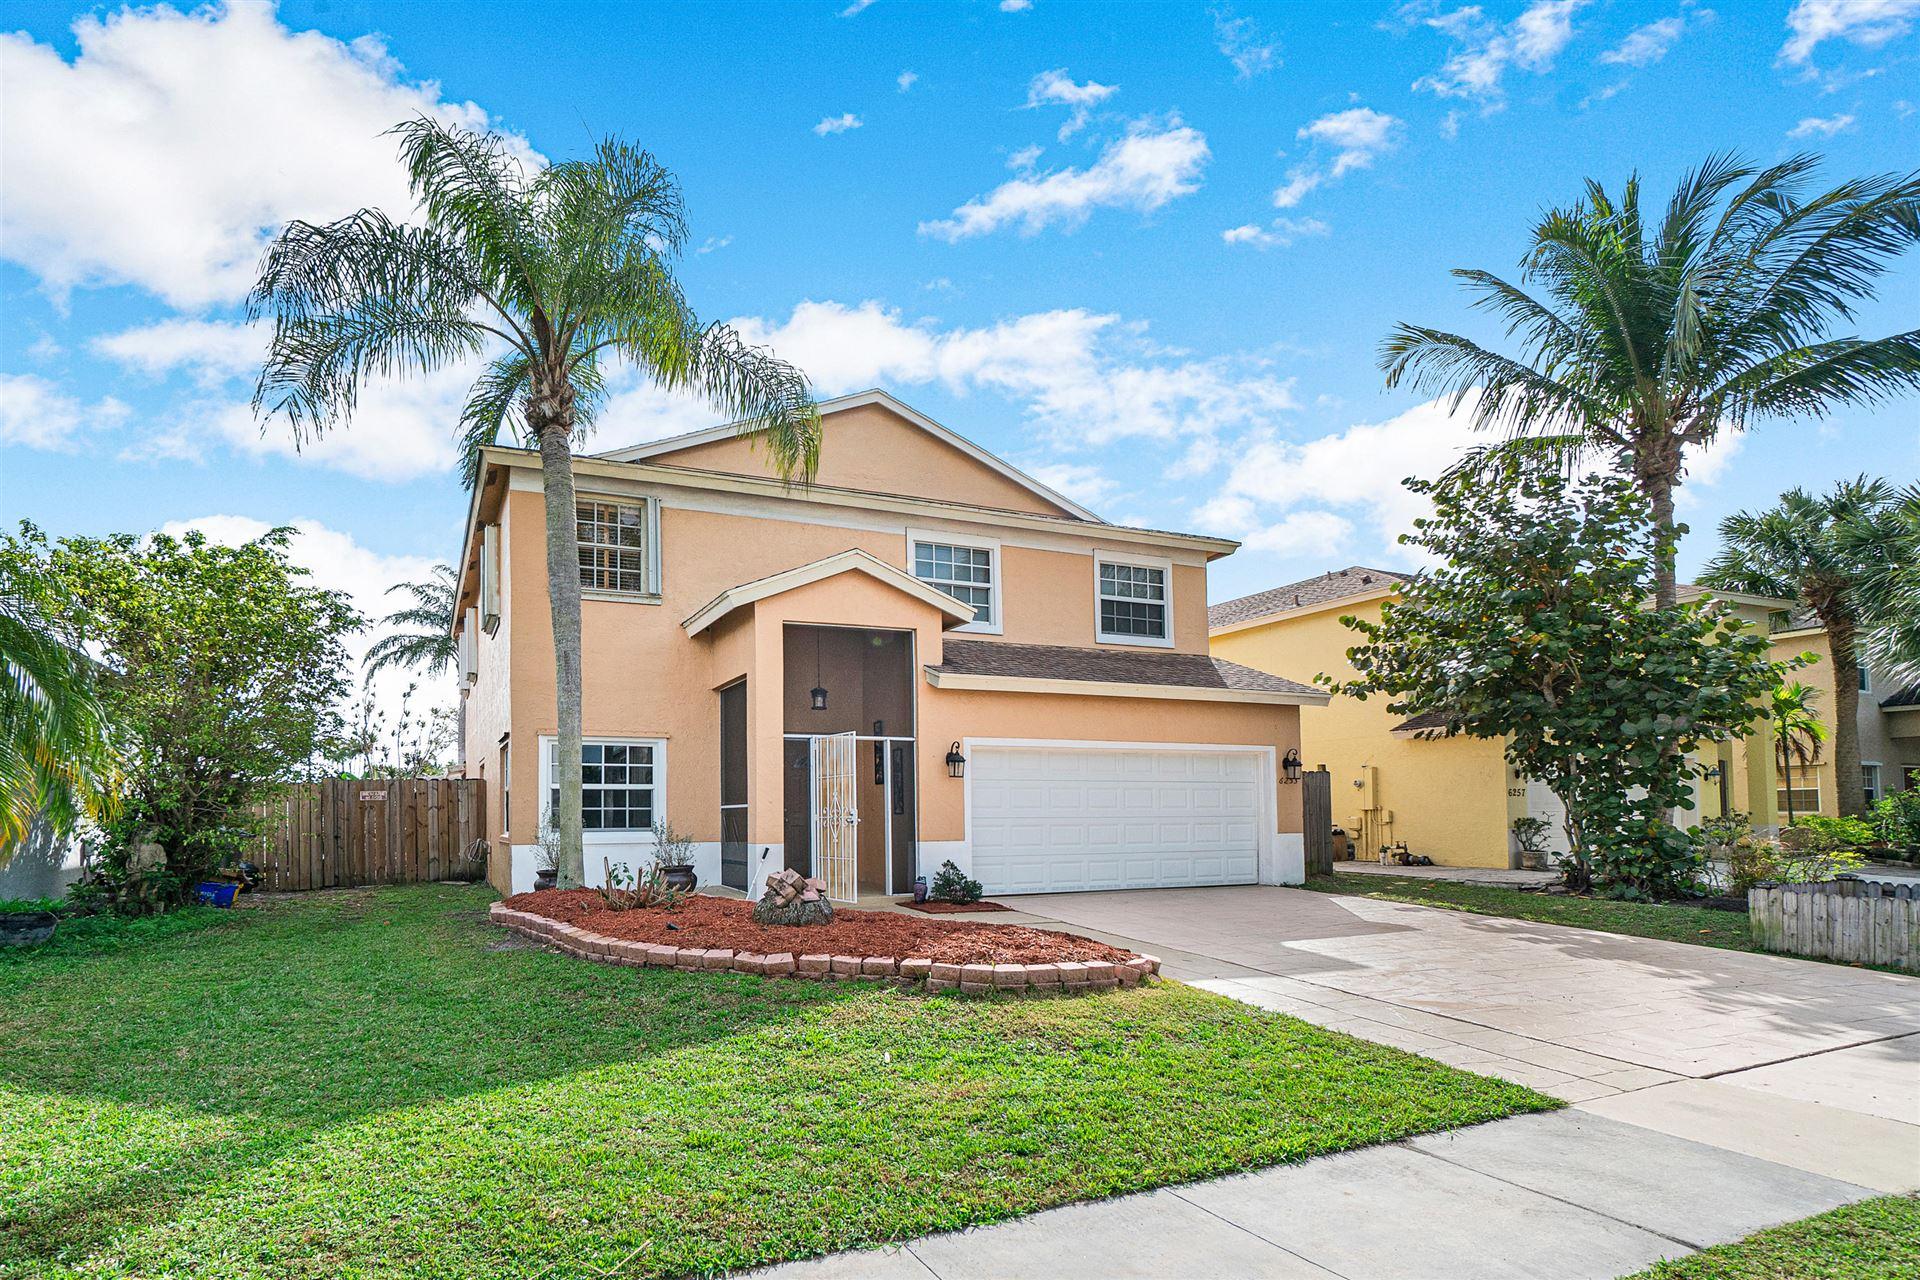 6253 Lansdowne Circle, Boynton Beach, FL 33472 - MLS#: RX-10694055